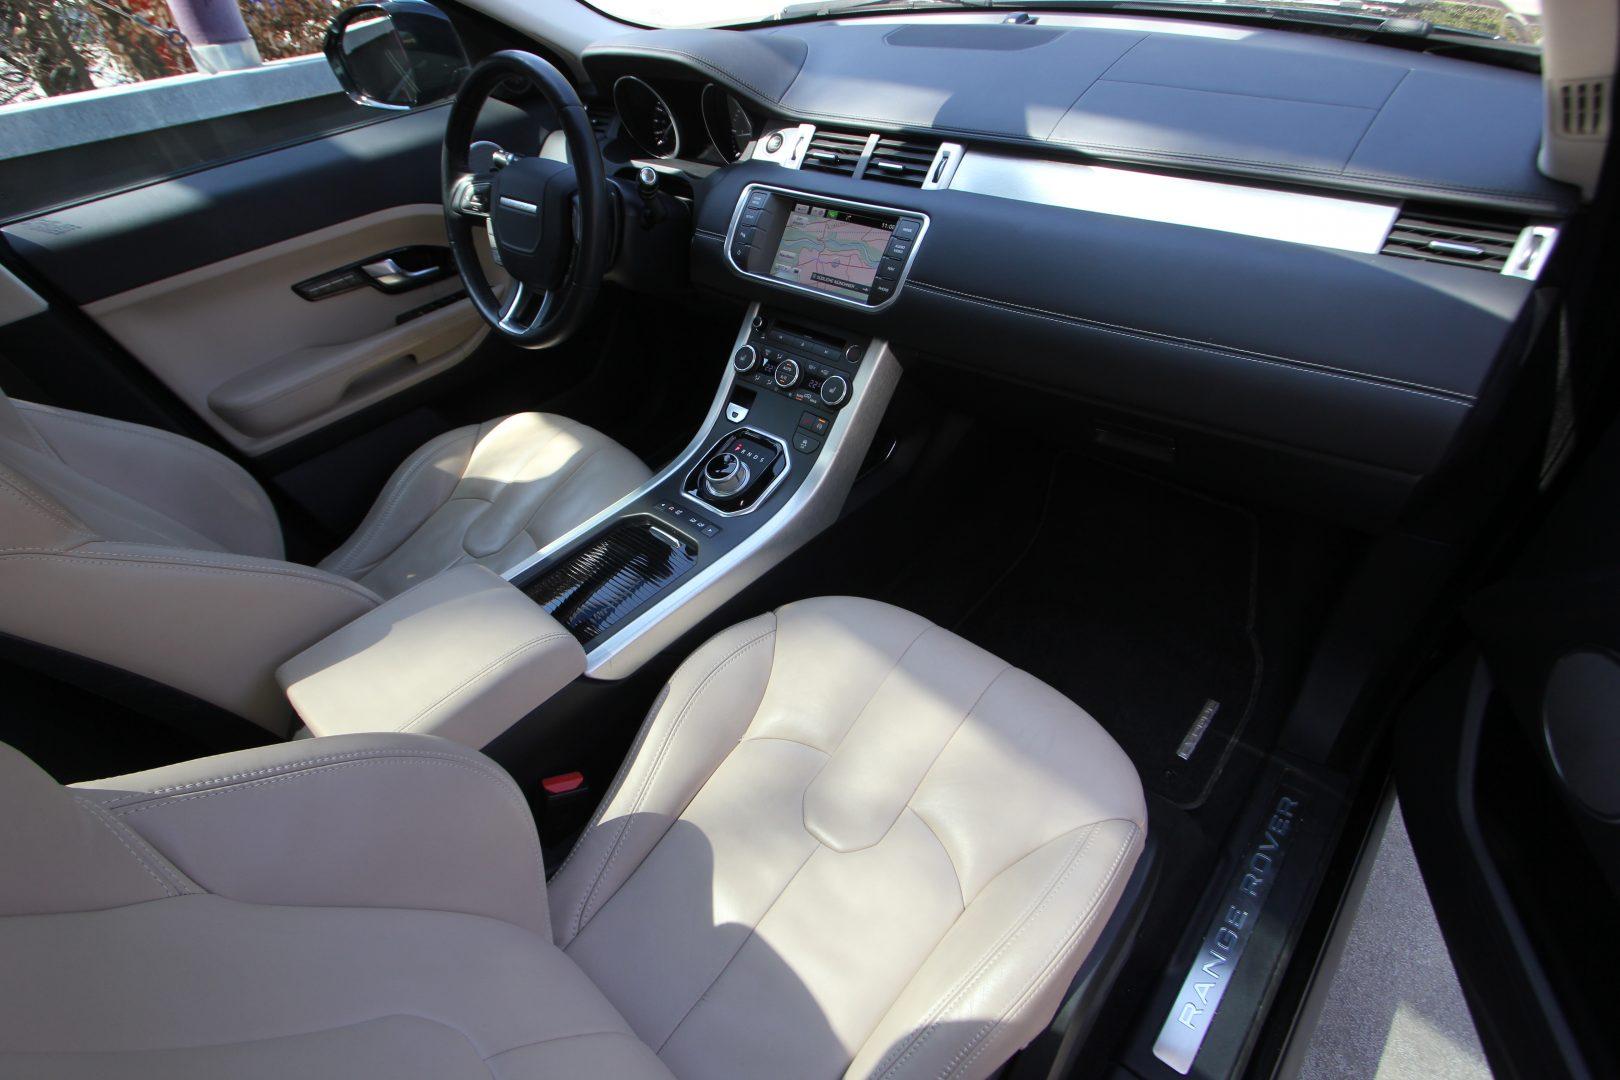 AIL Land Rover Range Rover Evoque Prestige 9